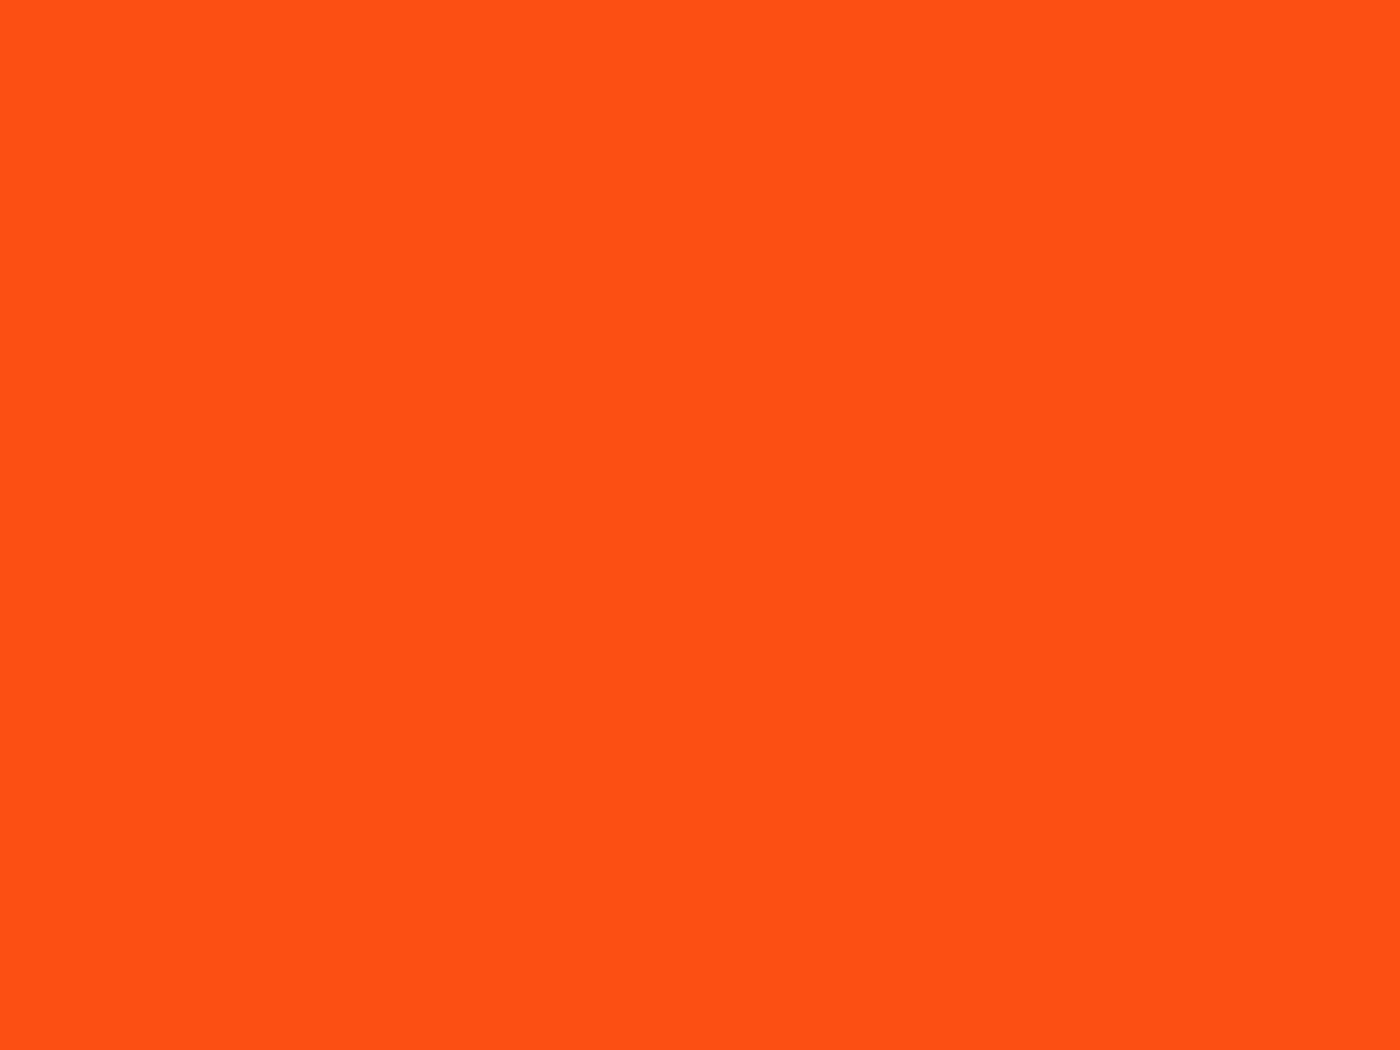 1400x1050 Orioles Orange Solid Color Background